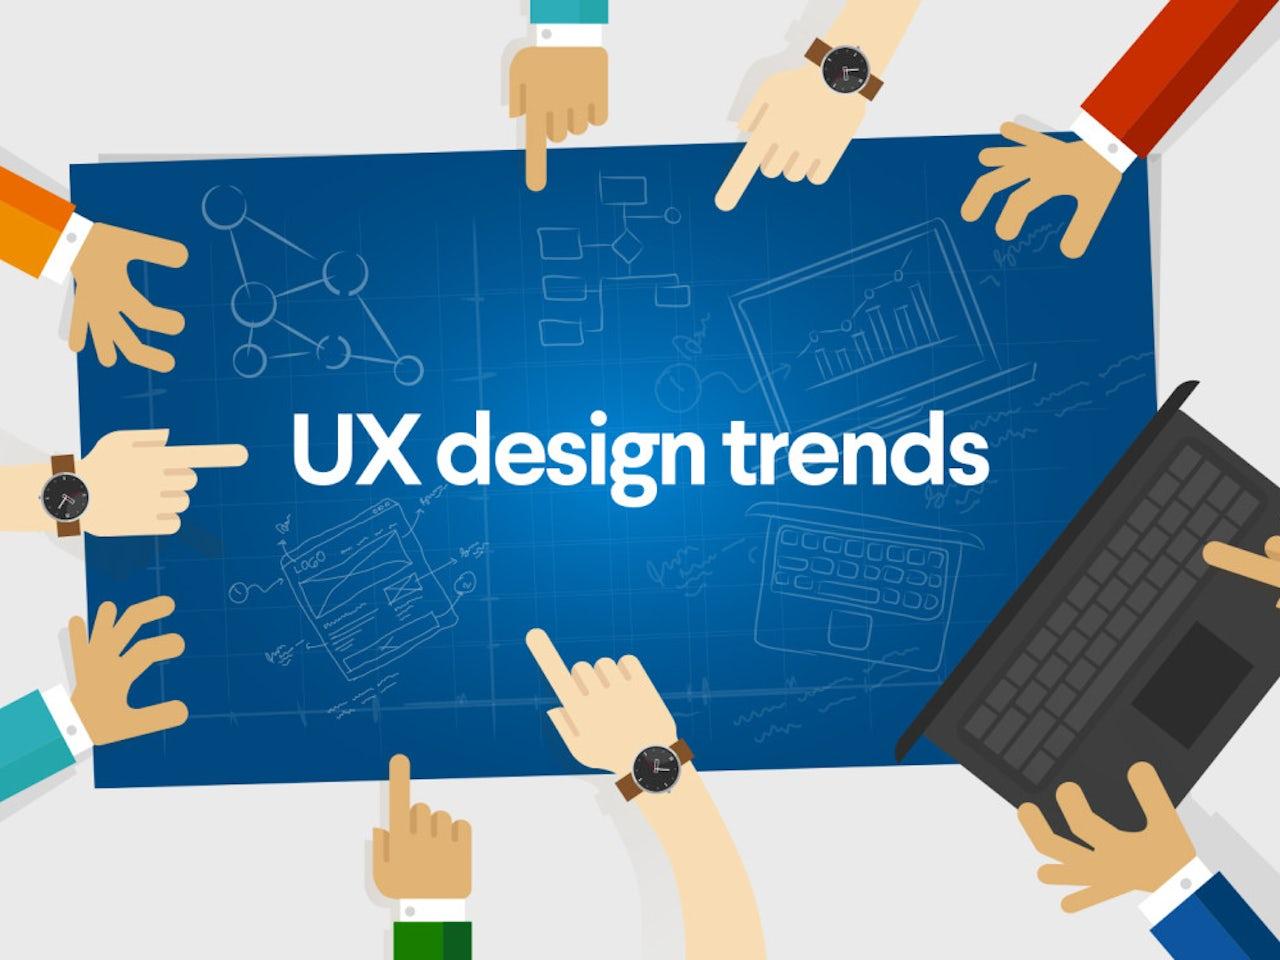 8 top UX design trends for 2021 - 99designs